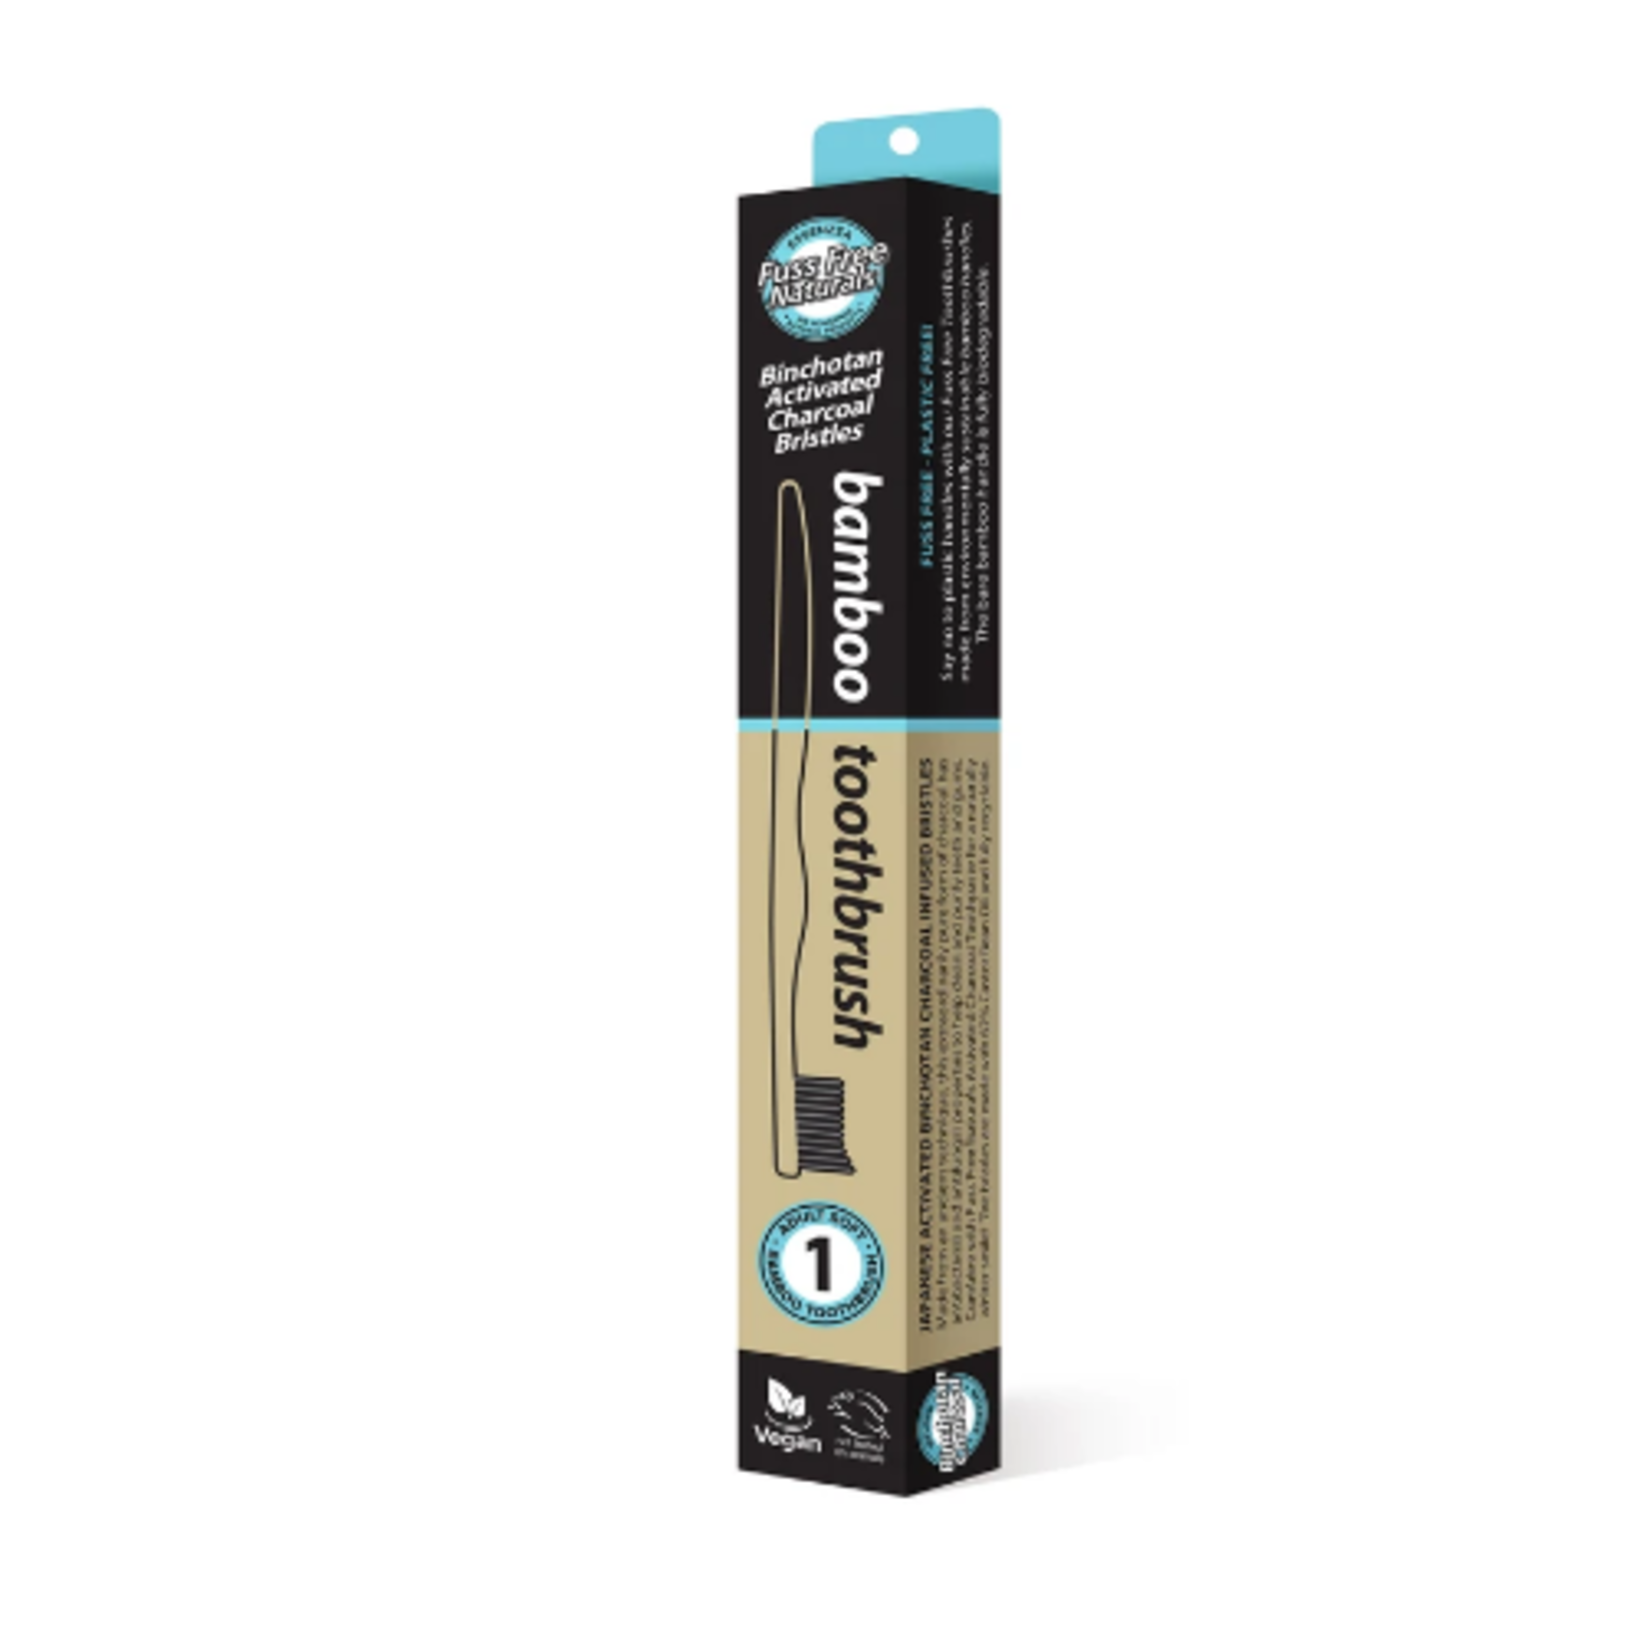 Fuss Free Naturals Fuss Free Naturals Bamboo ToothBrush Medium 4PK